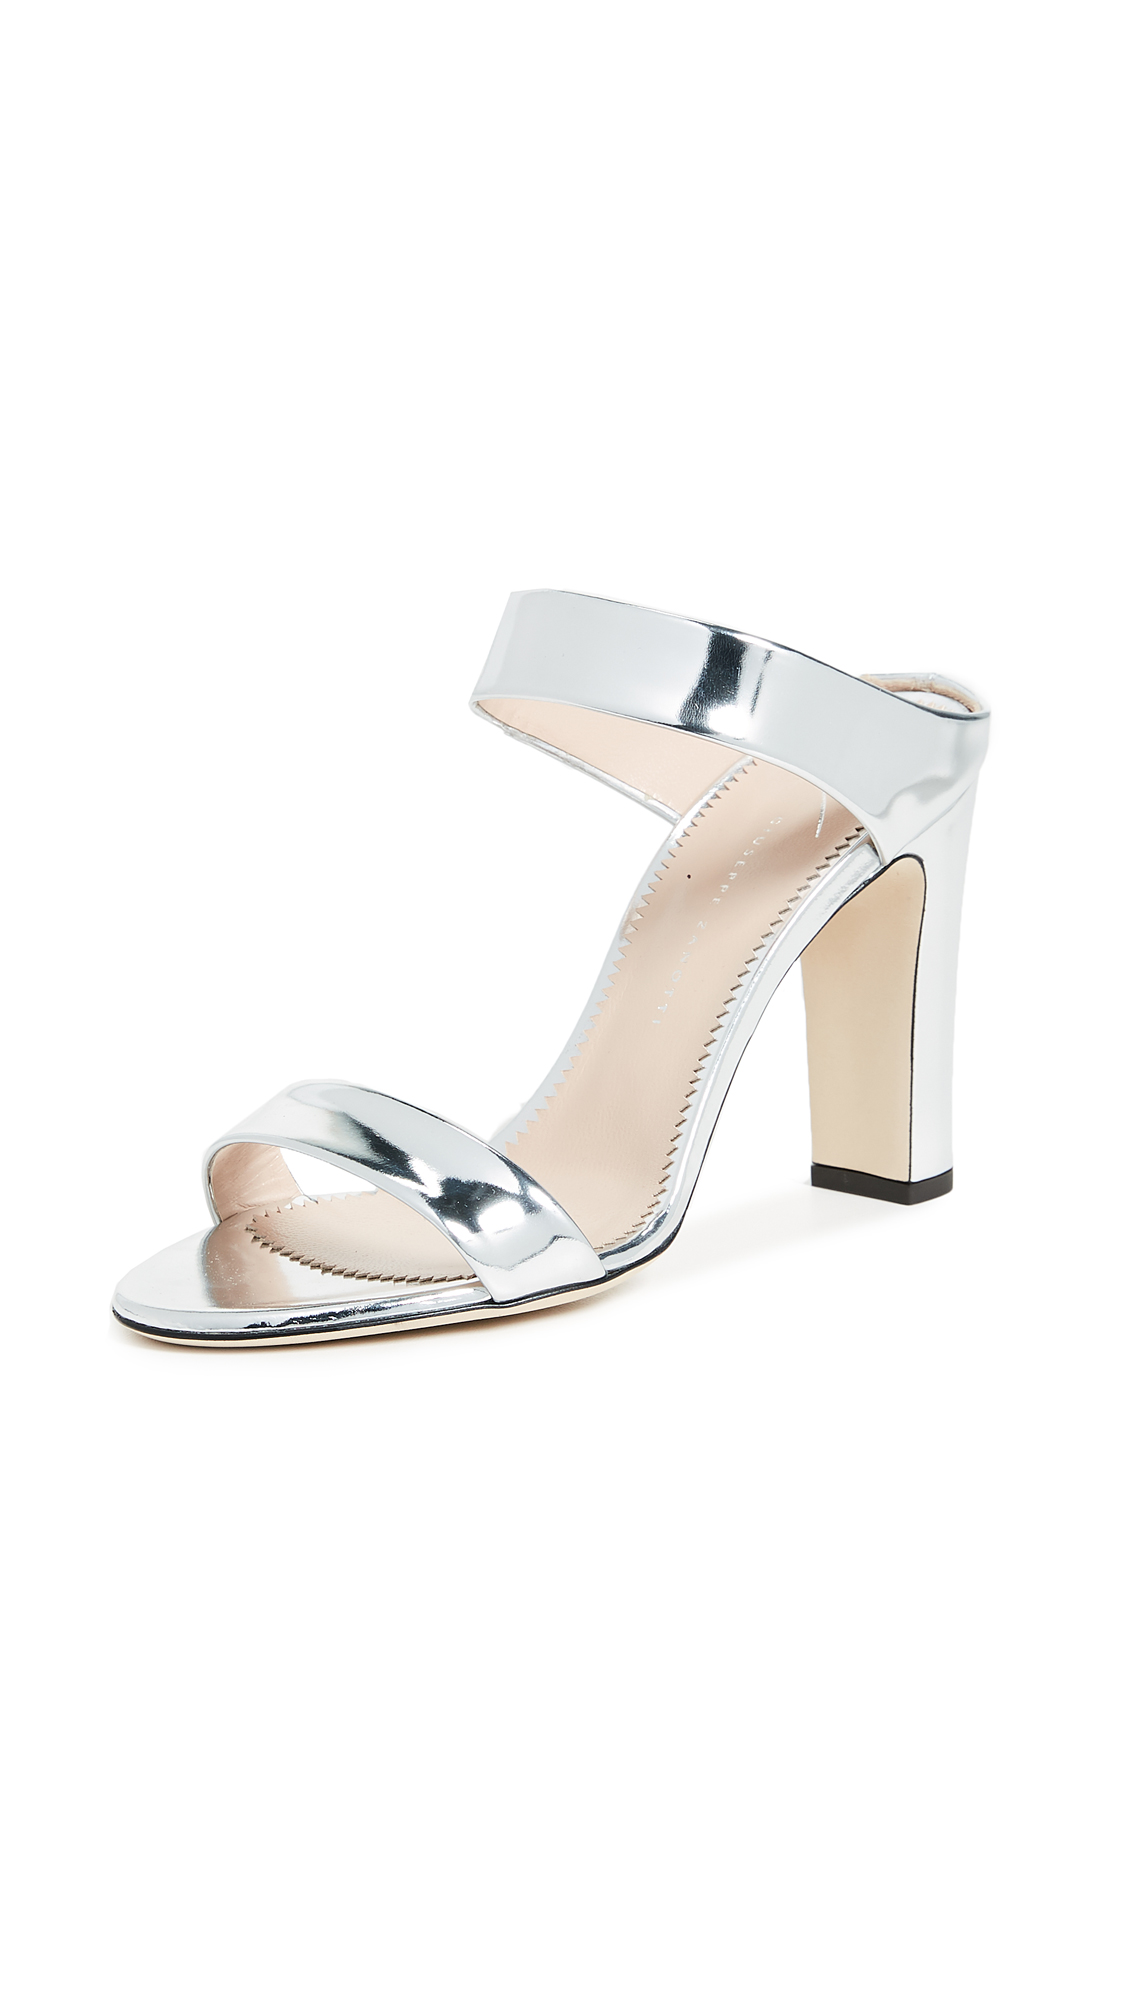 Giuseppe Zanotti Metallic Mule Sandals - Silver